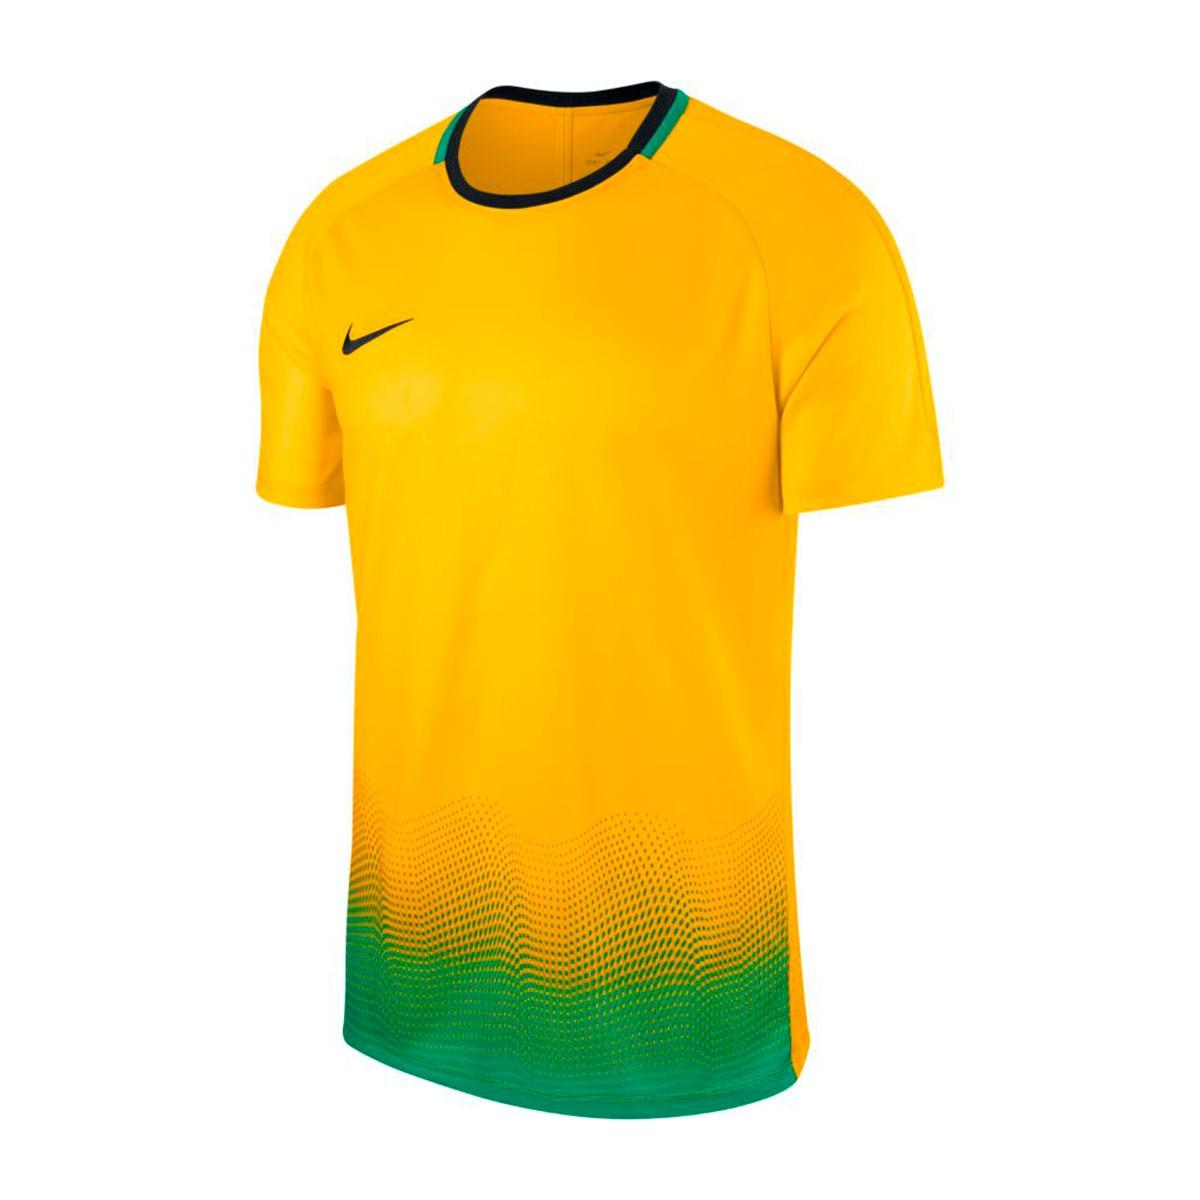 ca778e962 Jersey Nike Dry Academy GX Yellow-Lucky green-Black - Tienda de ...